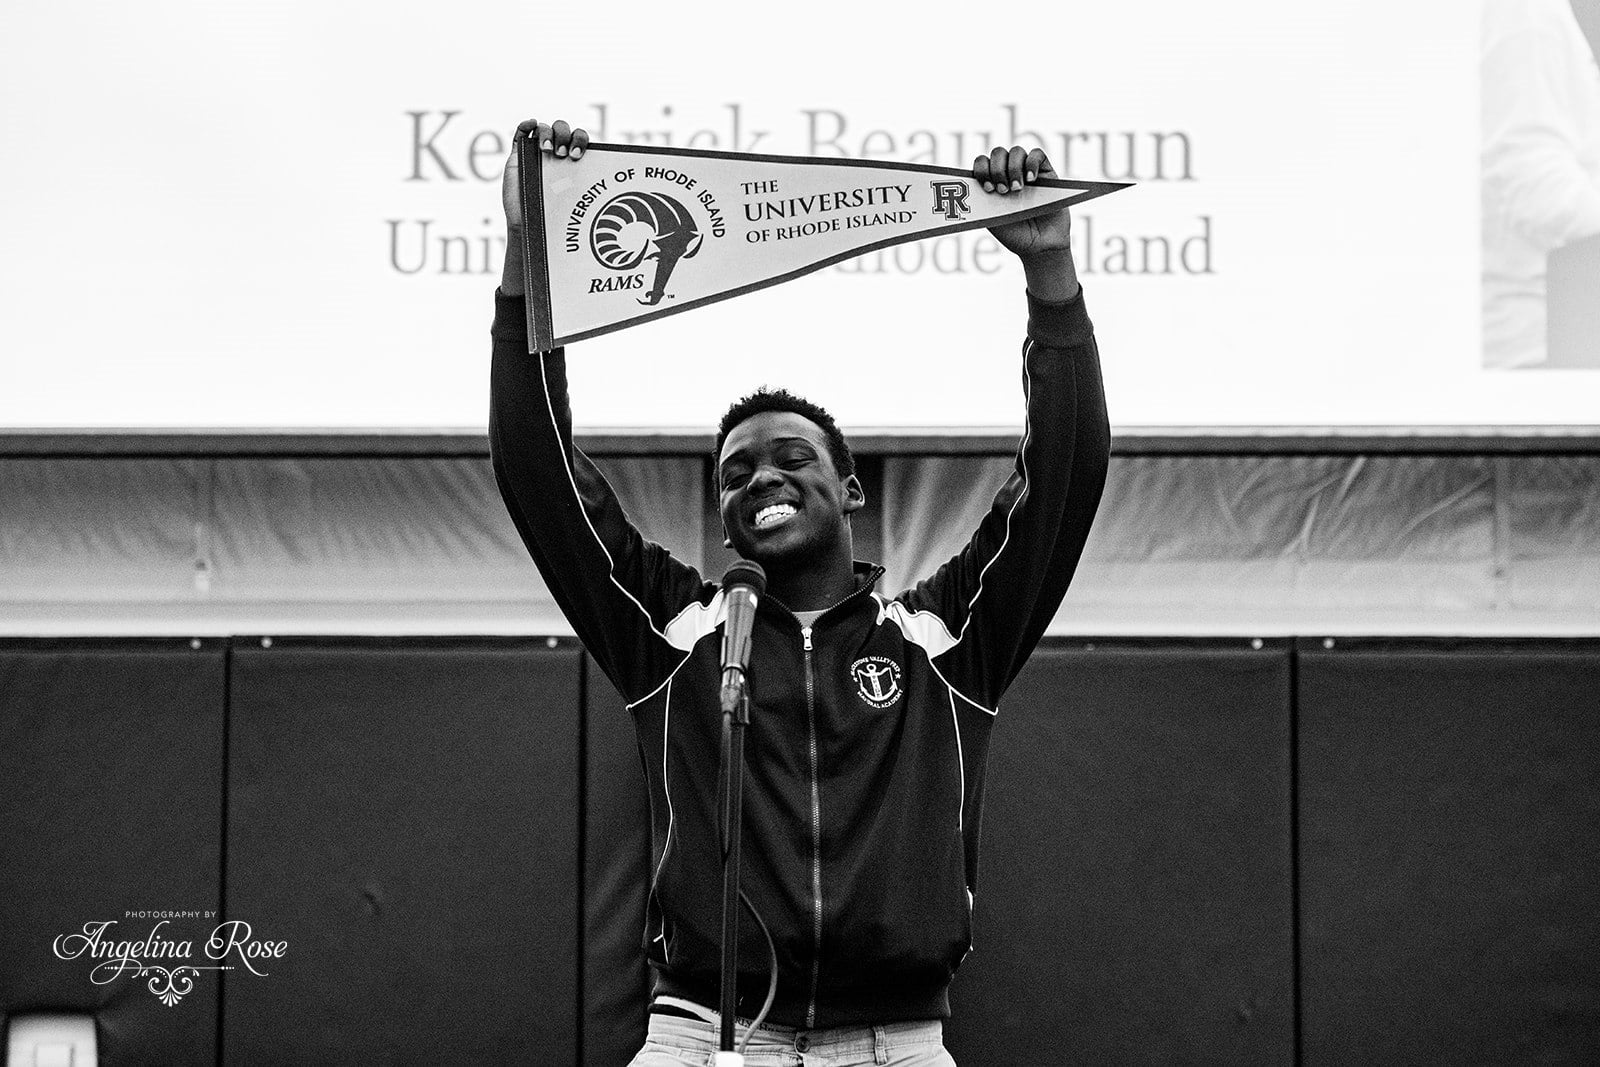 Scholar holding up URI banner